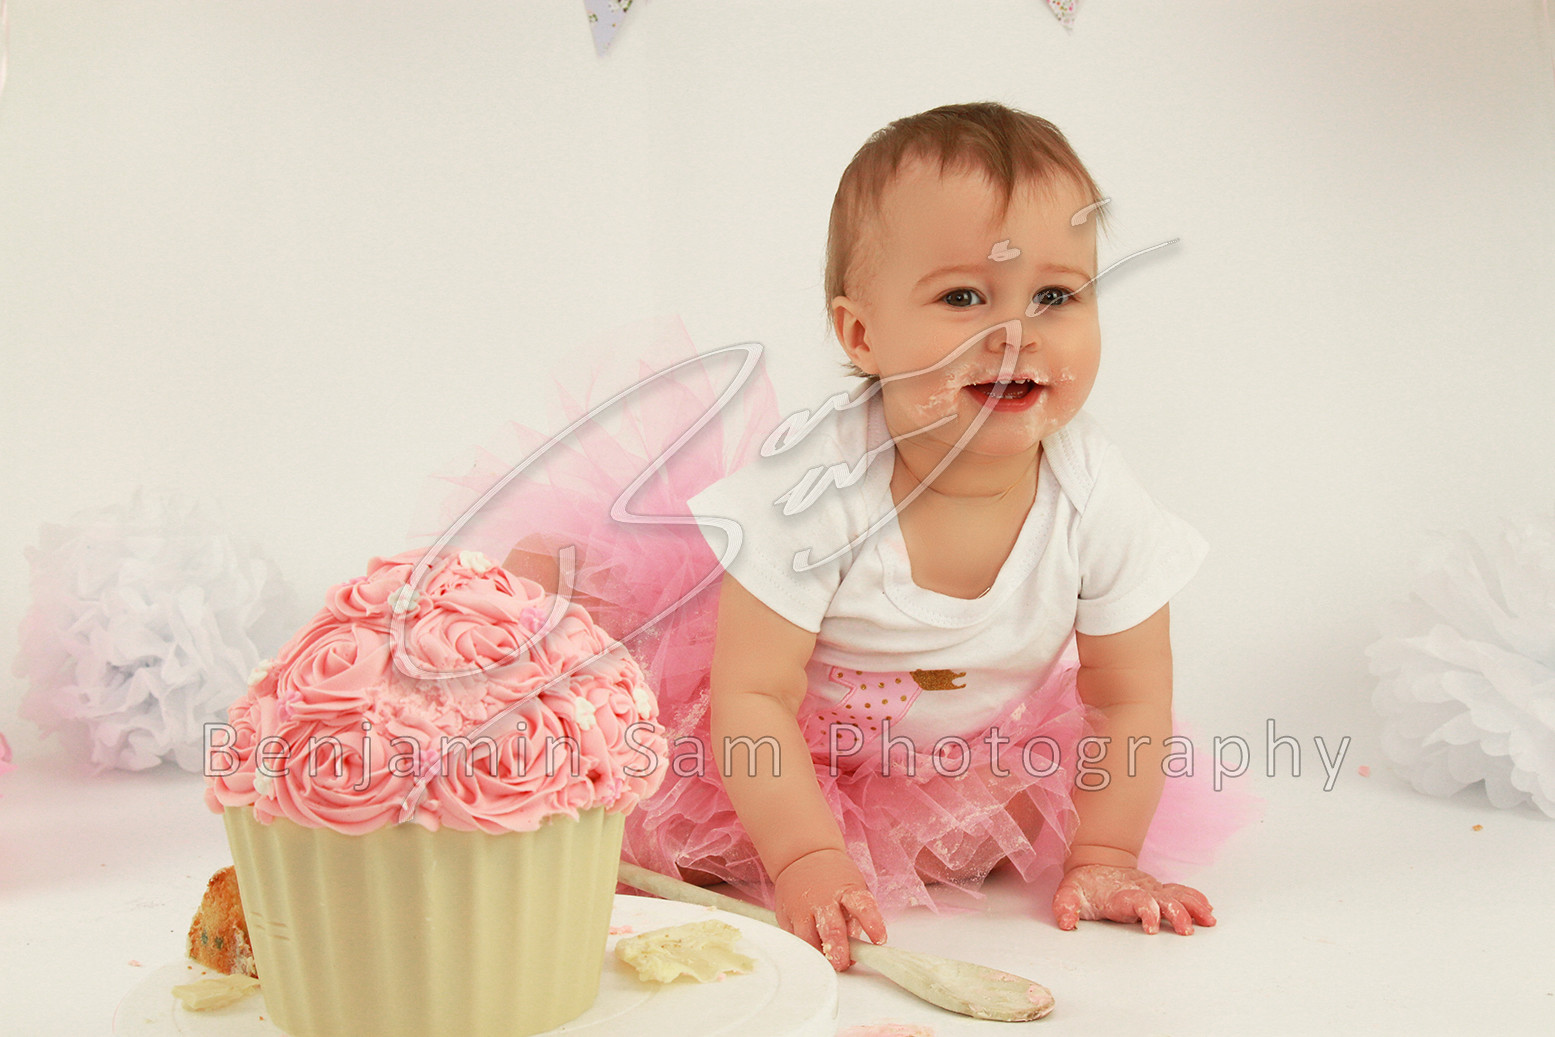 Cake - WM - 013